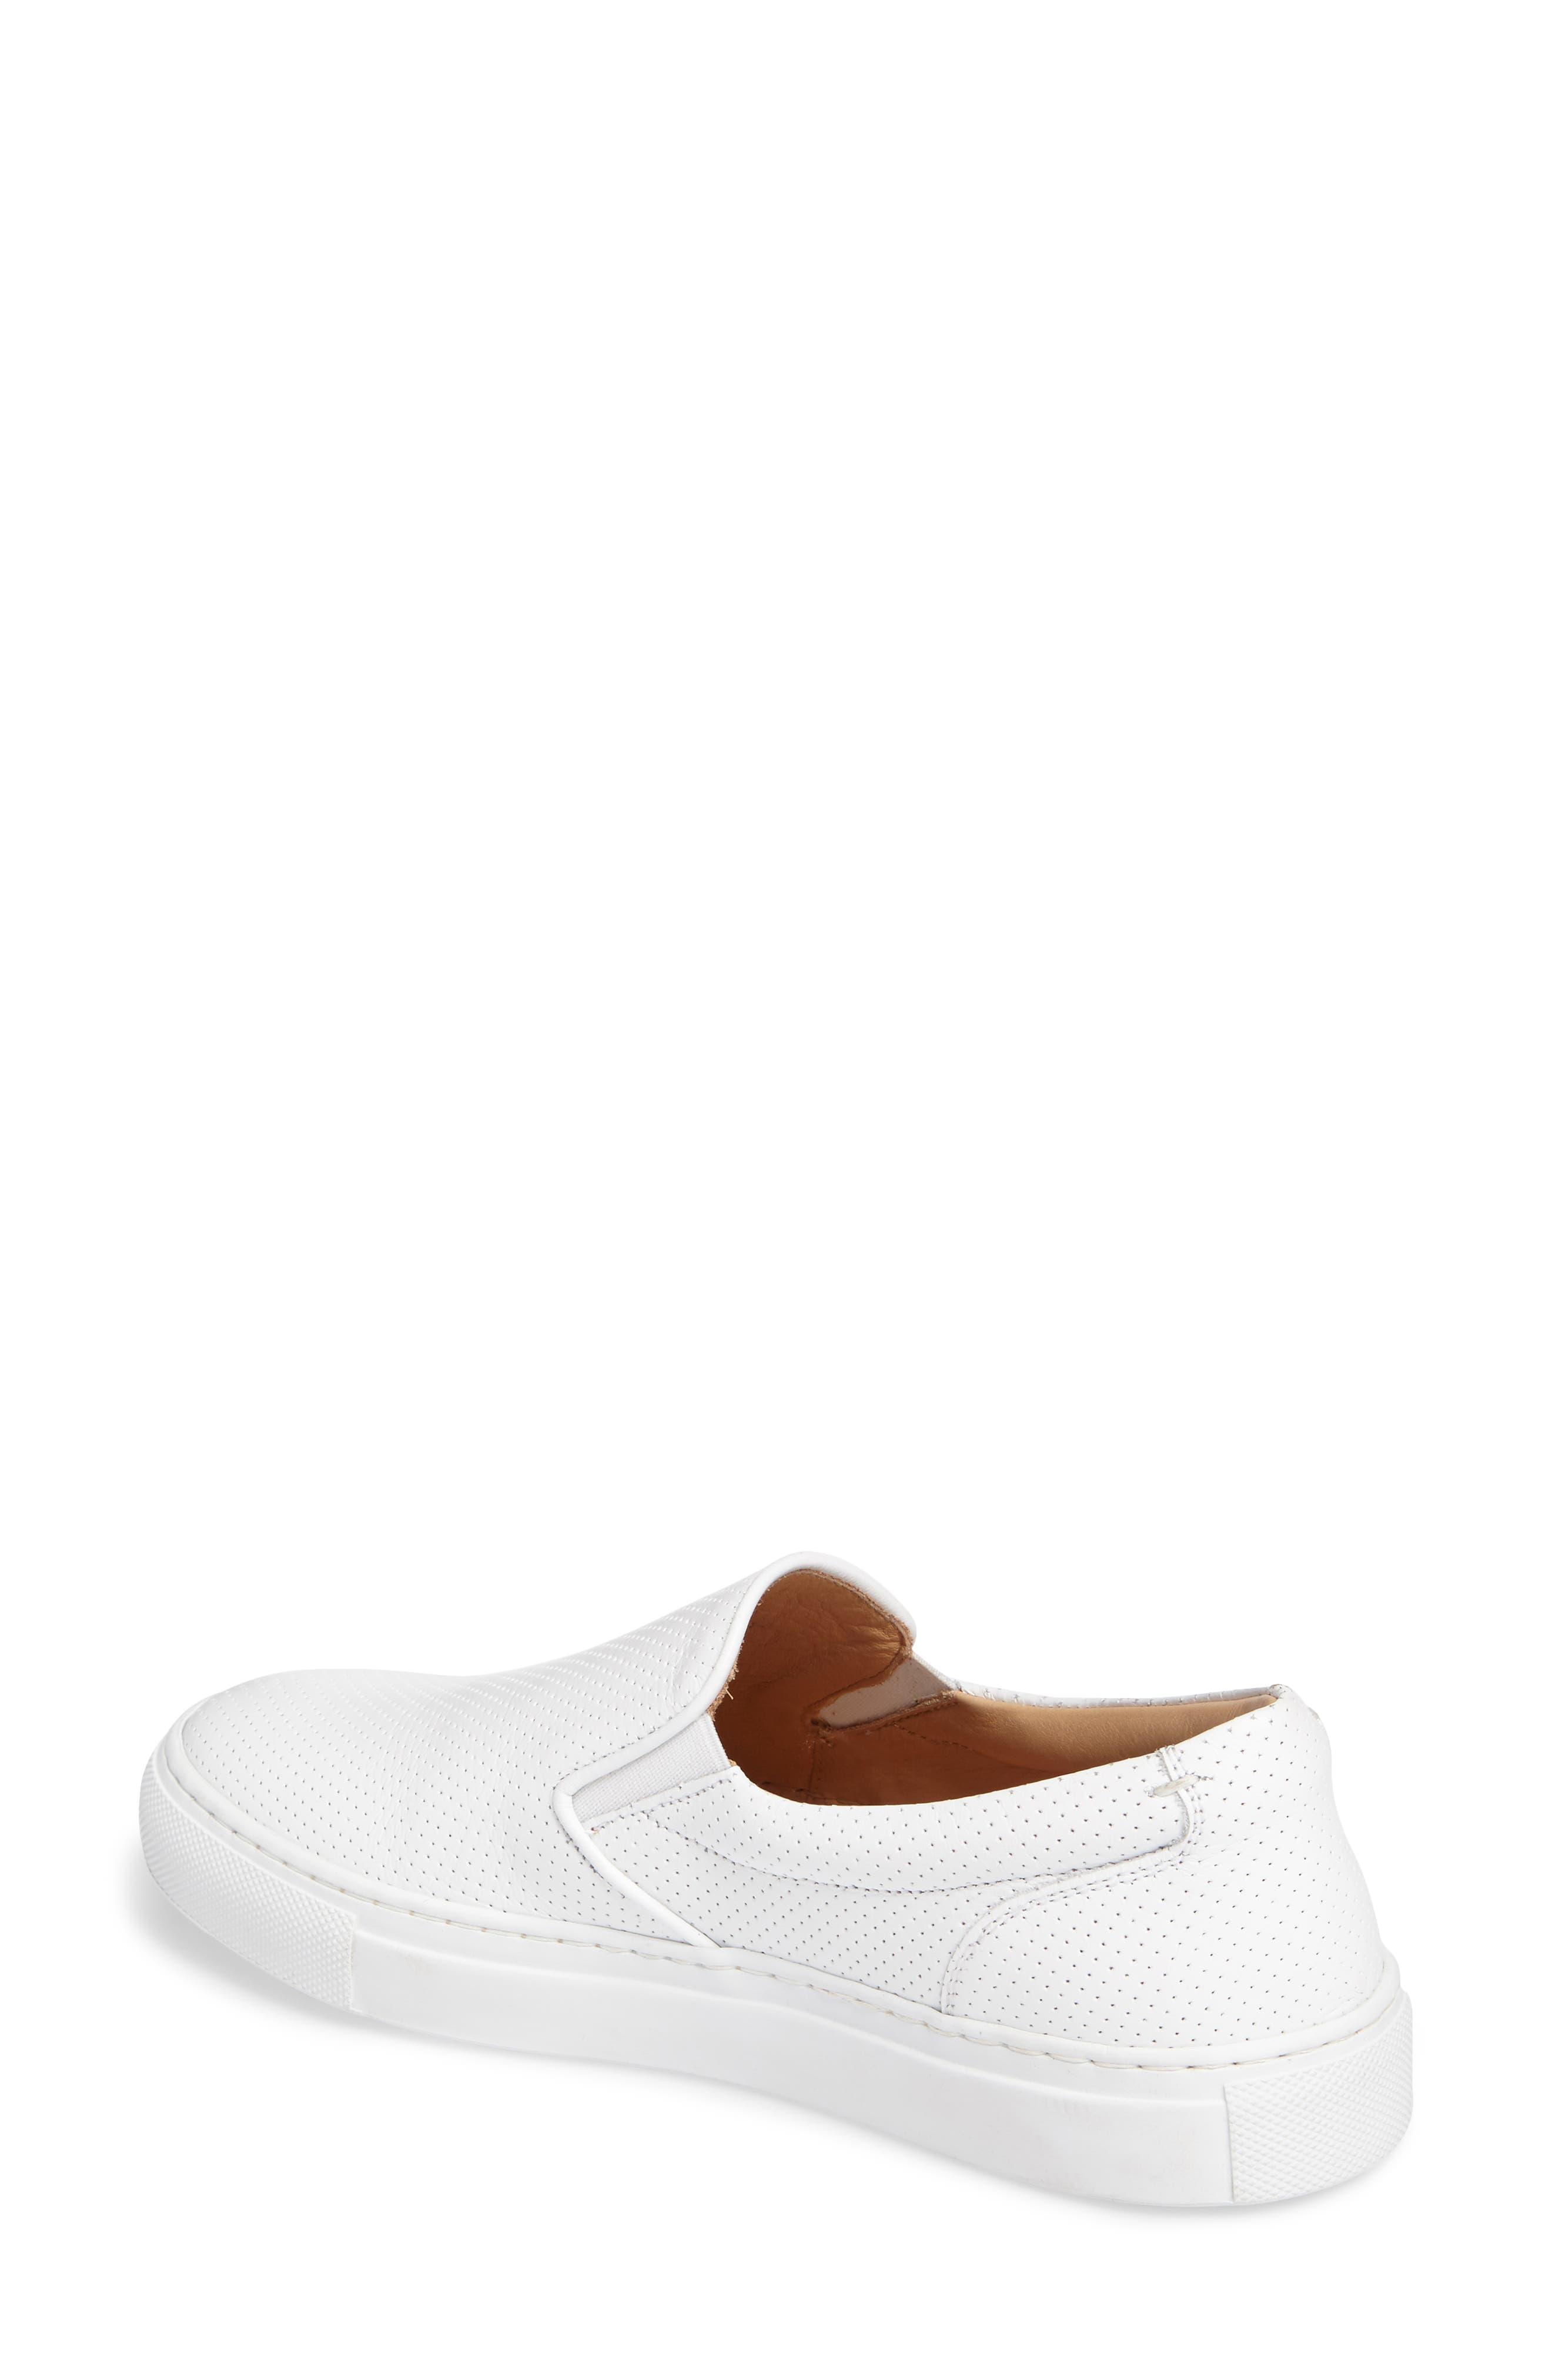 Wooster Slip-On Sneaker,                             Alternate thumbnail 2, color,                             WHITE PERFORATED